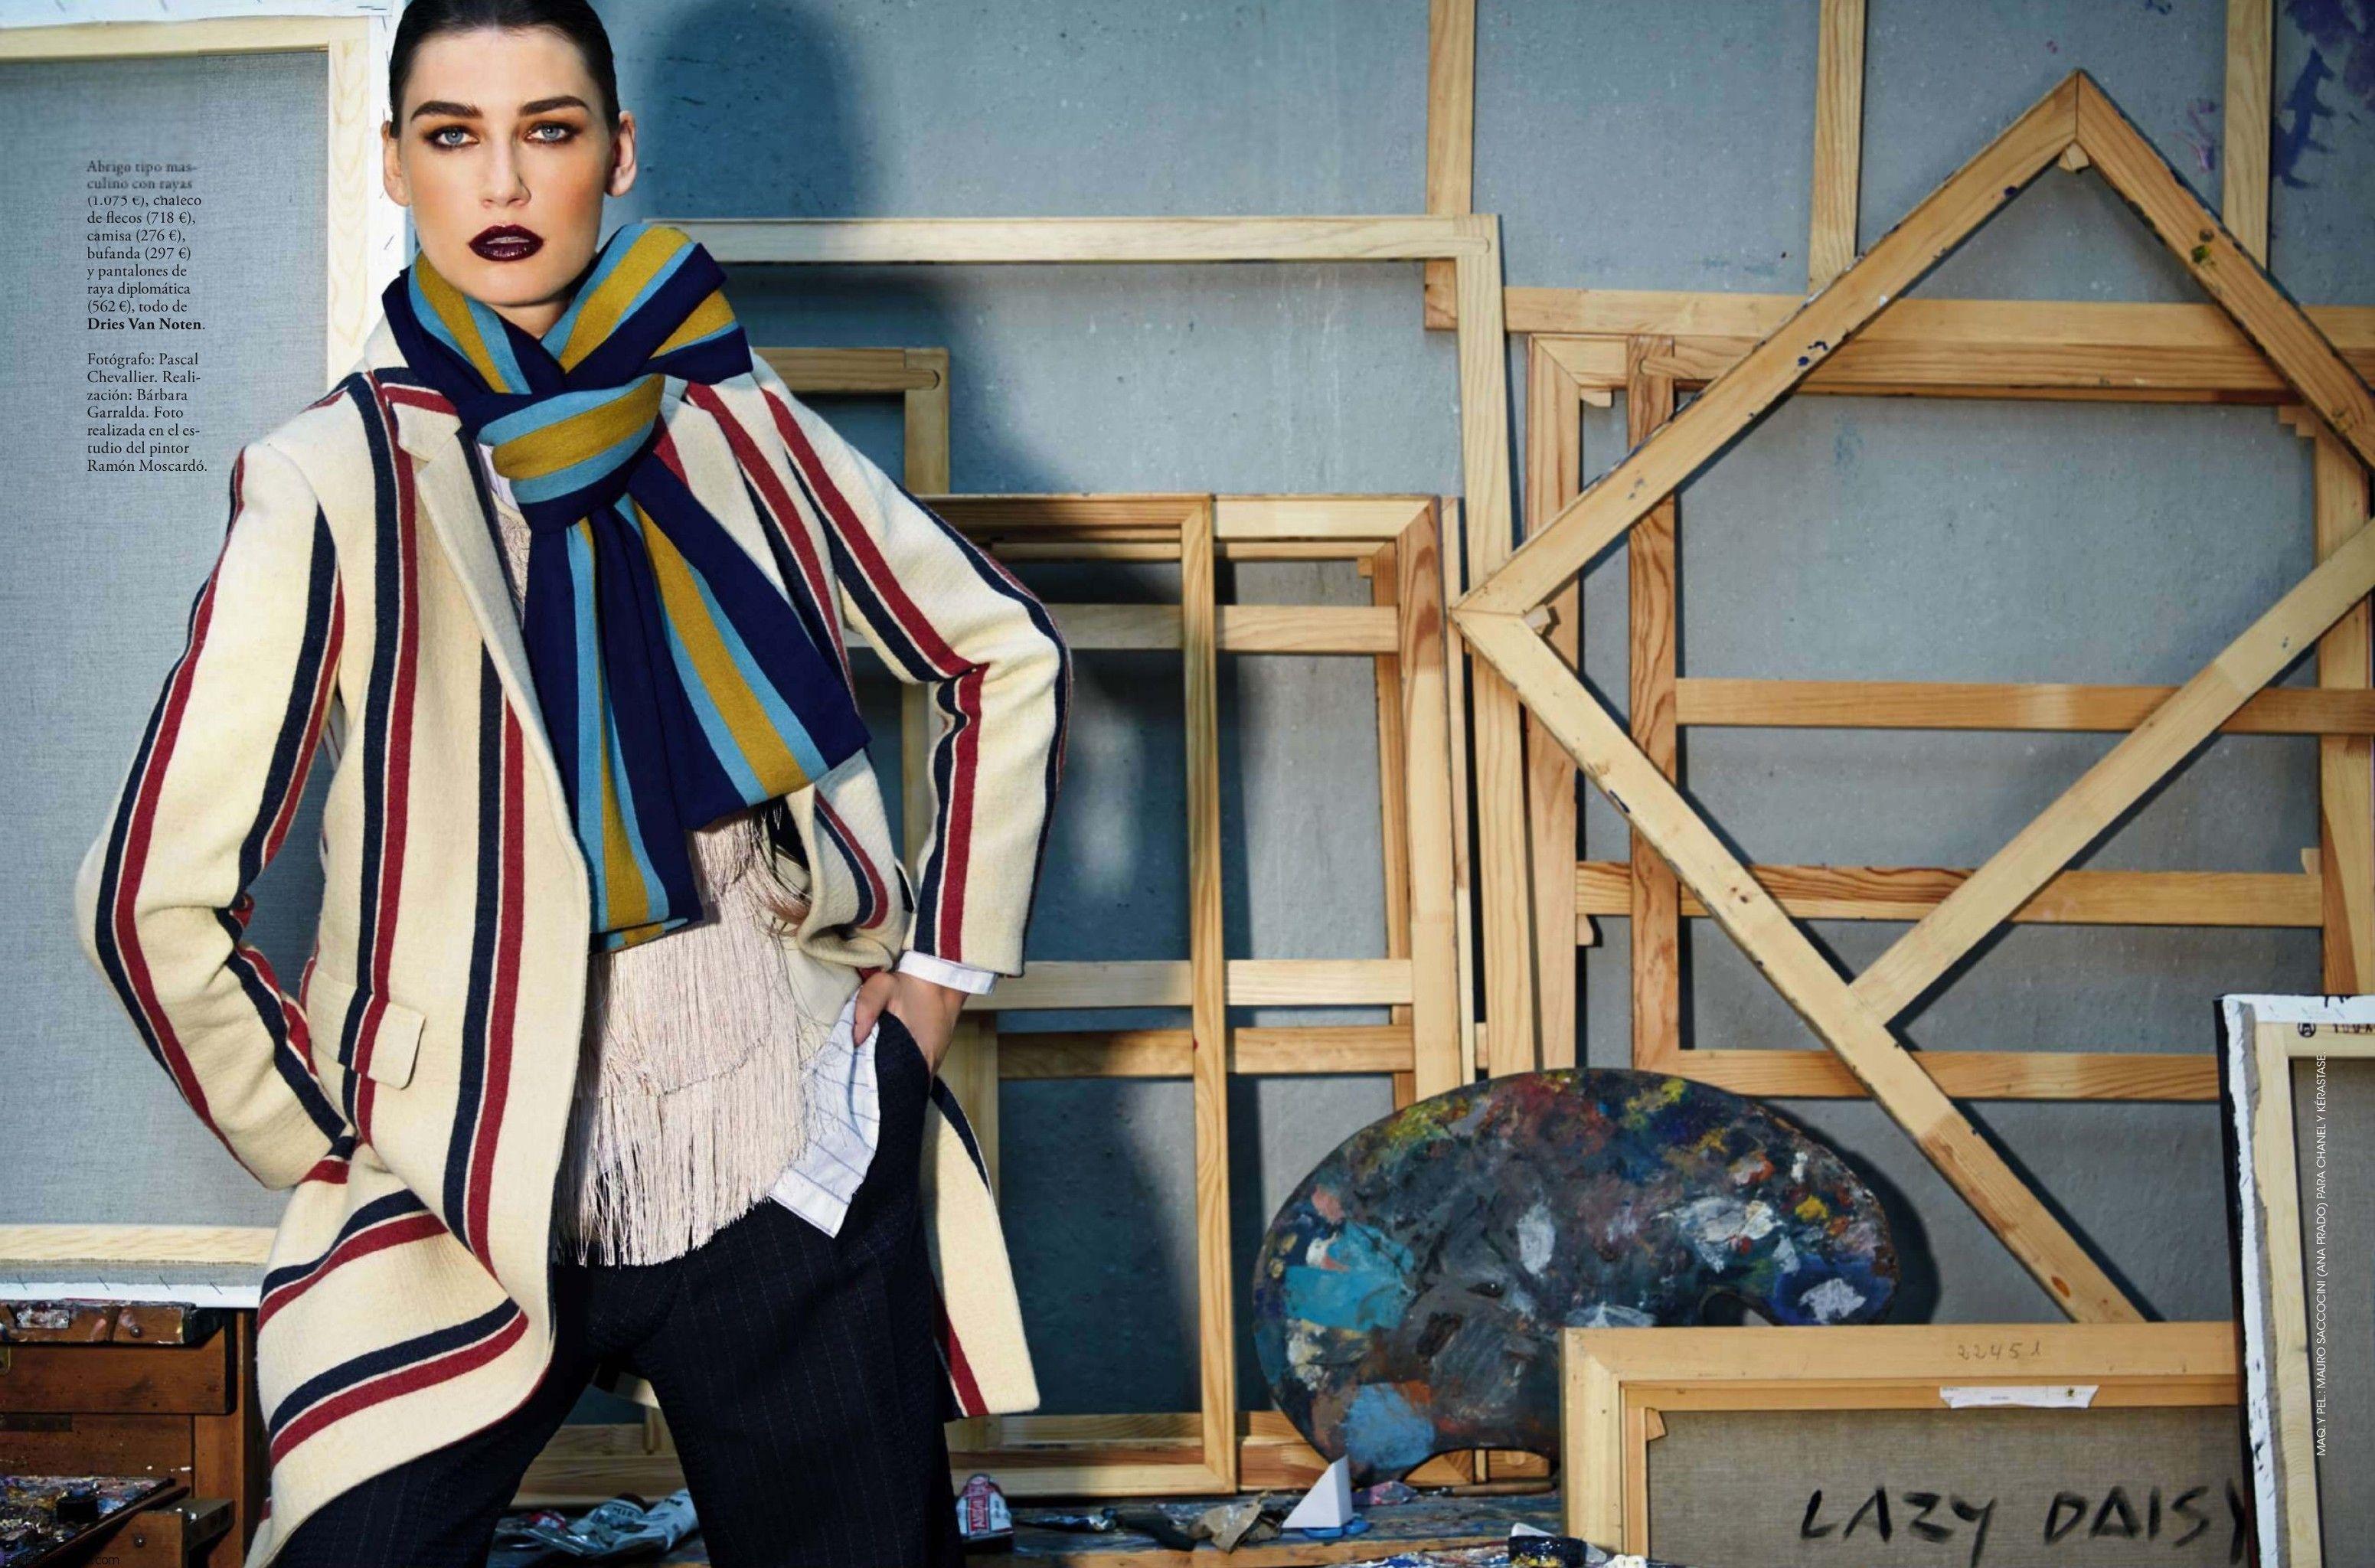 fashion_scans_remastered-eugenia_volodina-elle_espana-september_2013-scanned_by_vampirehorde-hq-21